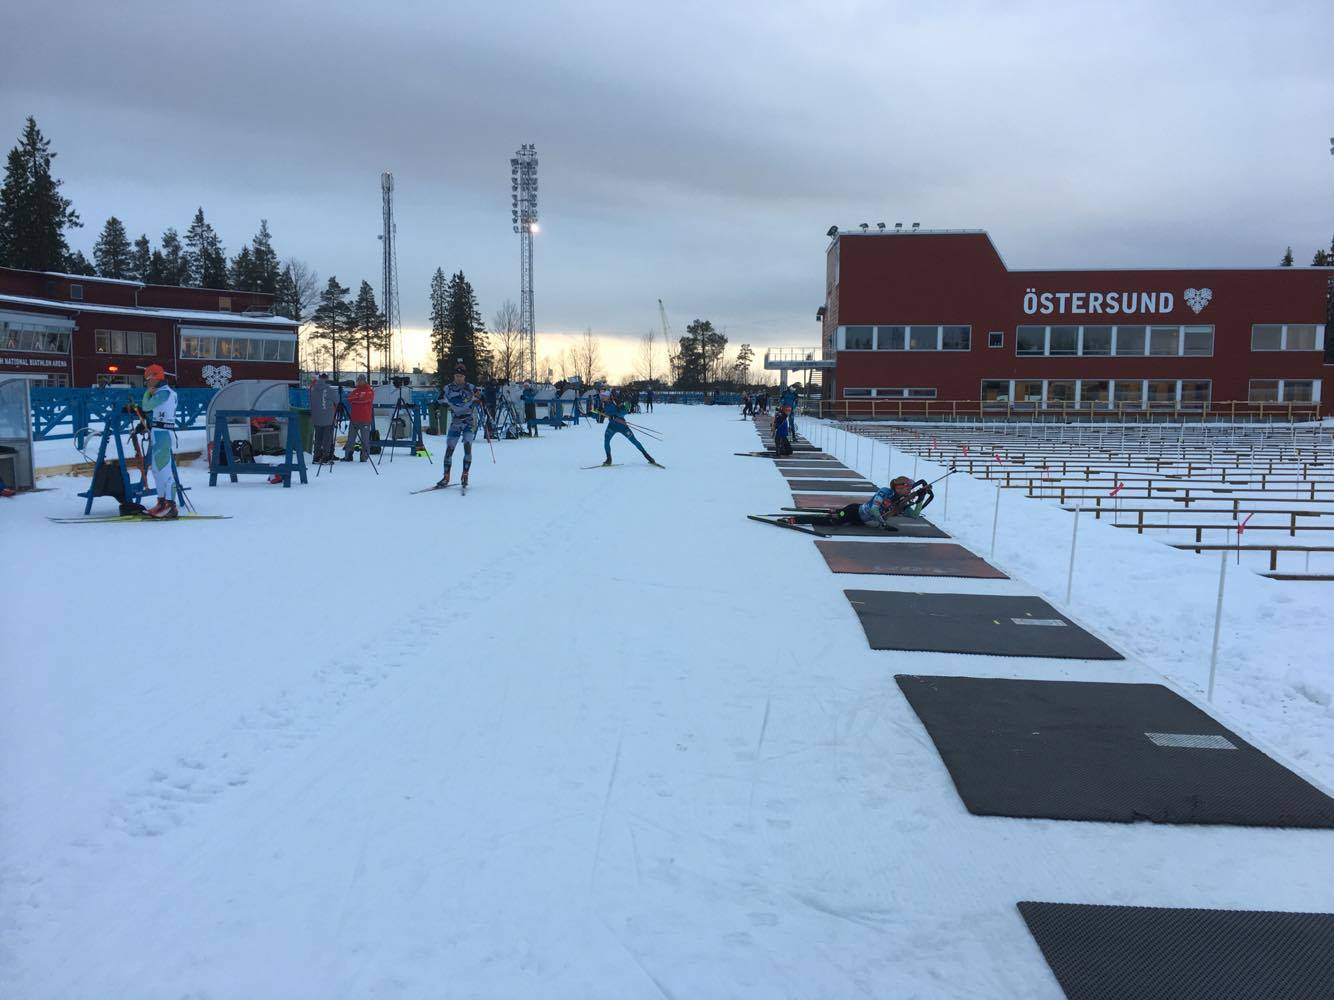 Många skidskyttar nu på Östersund Skidstadion